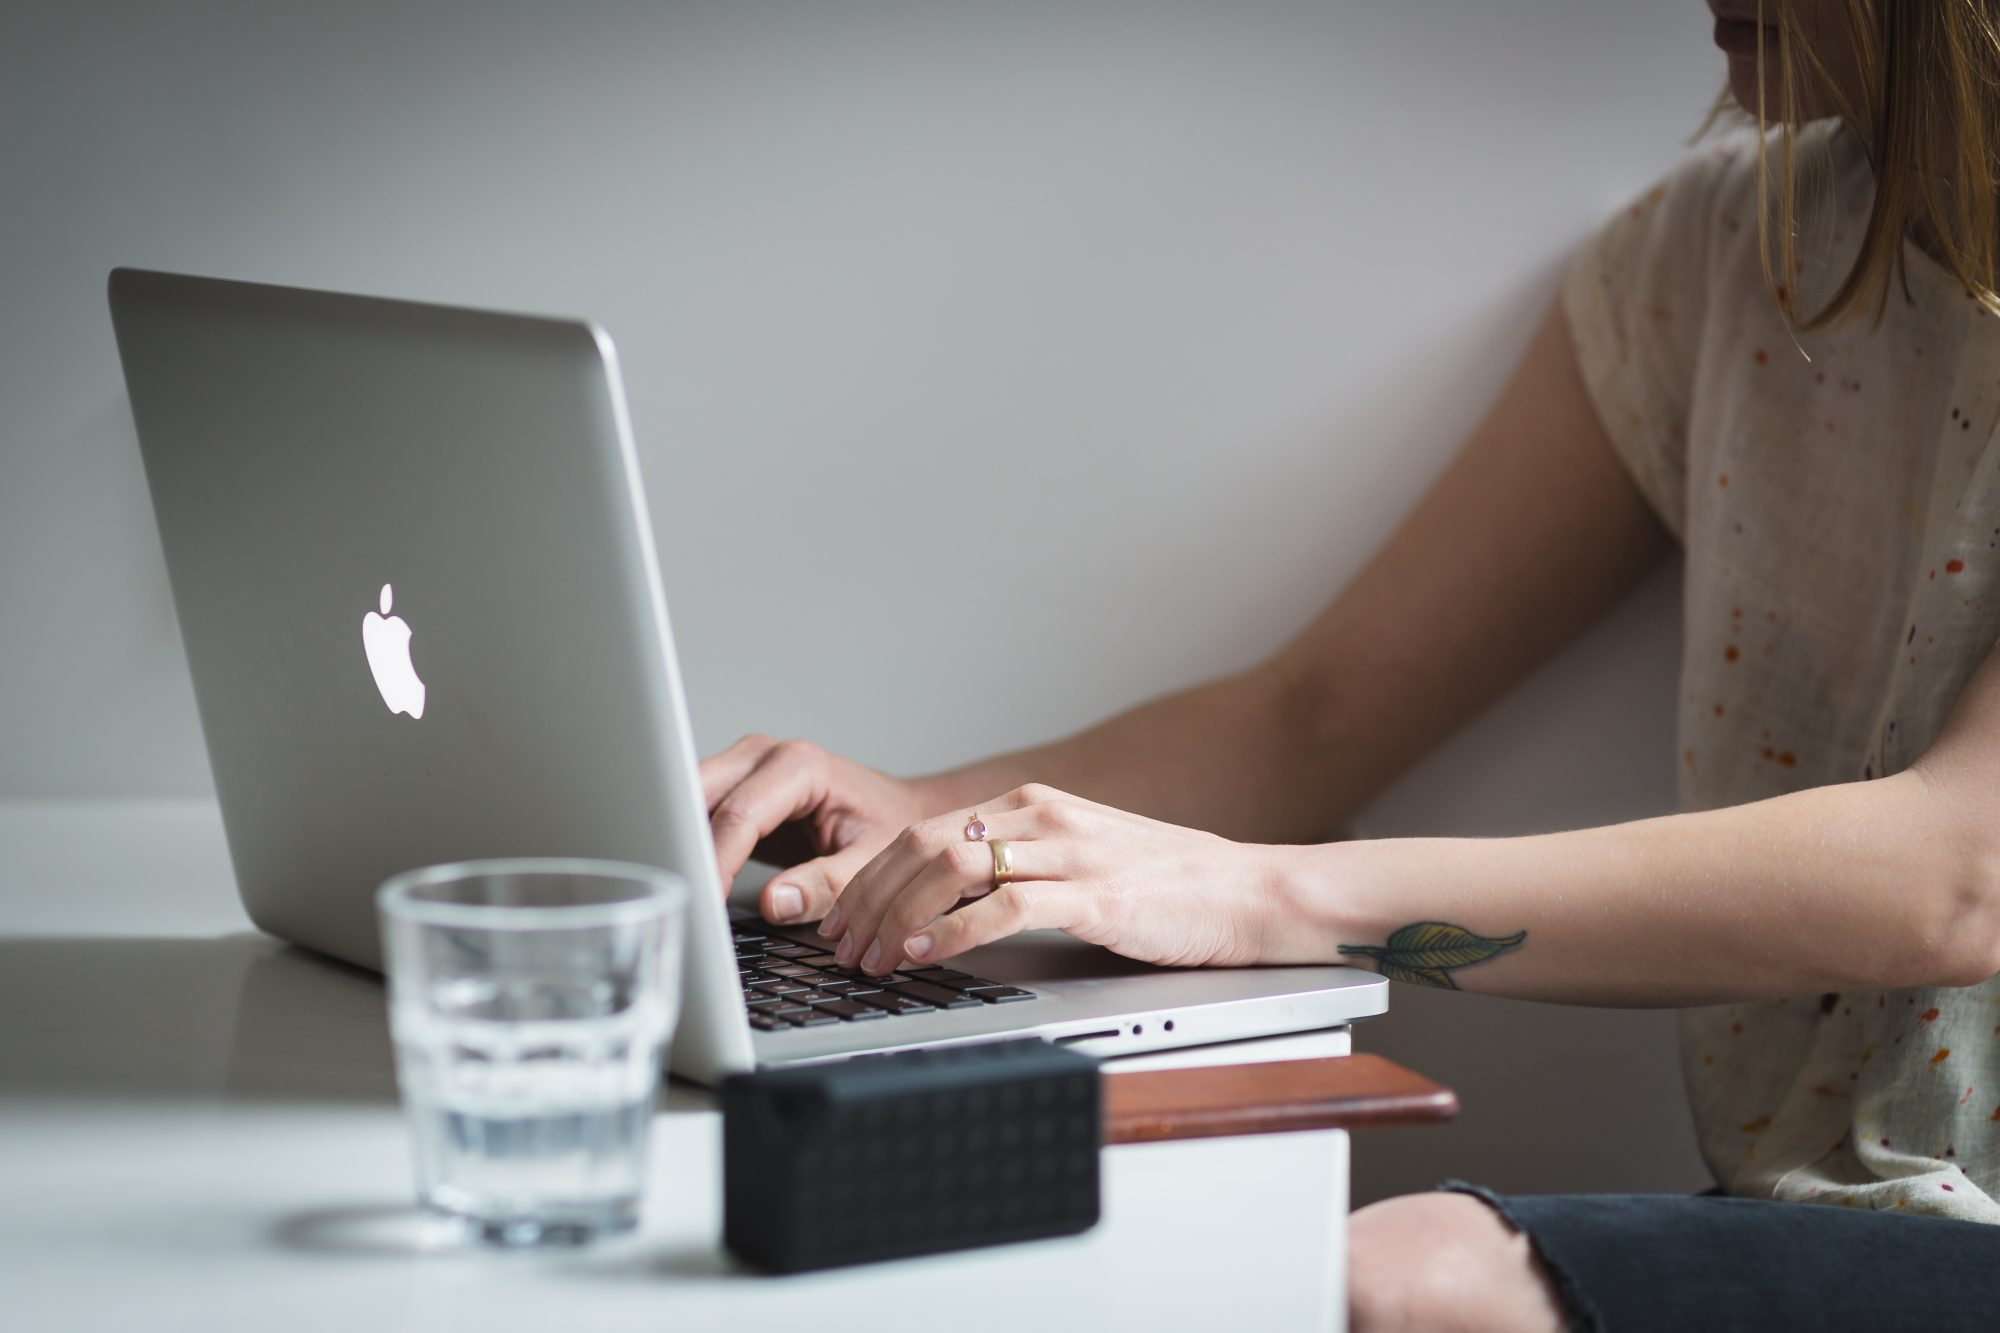 online dating rape culture